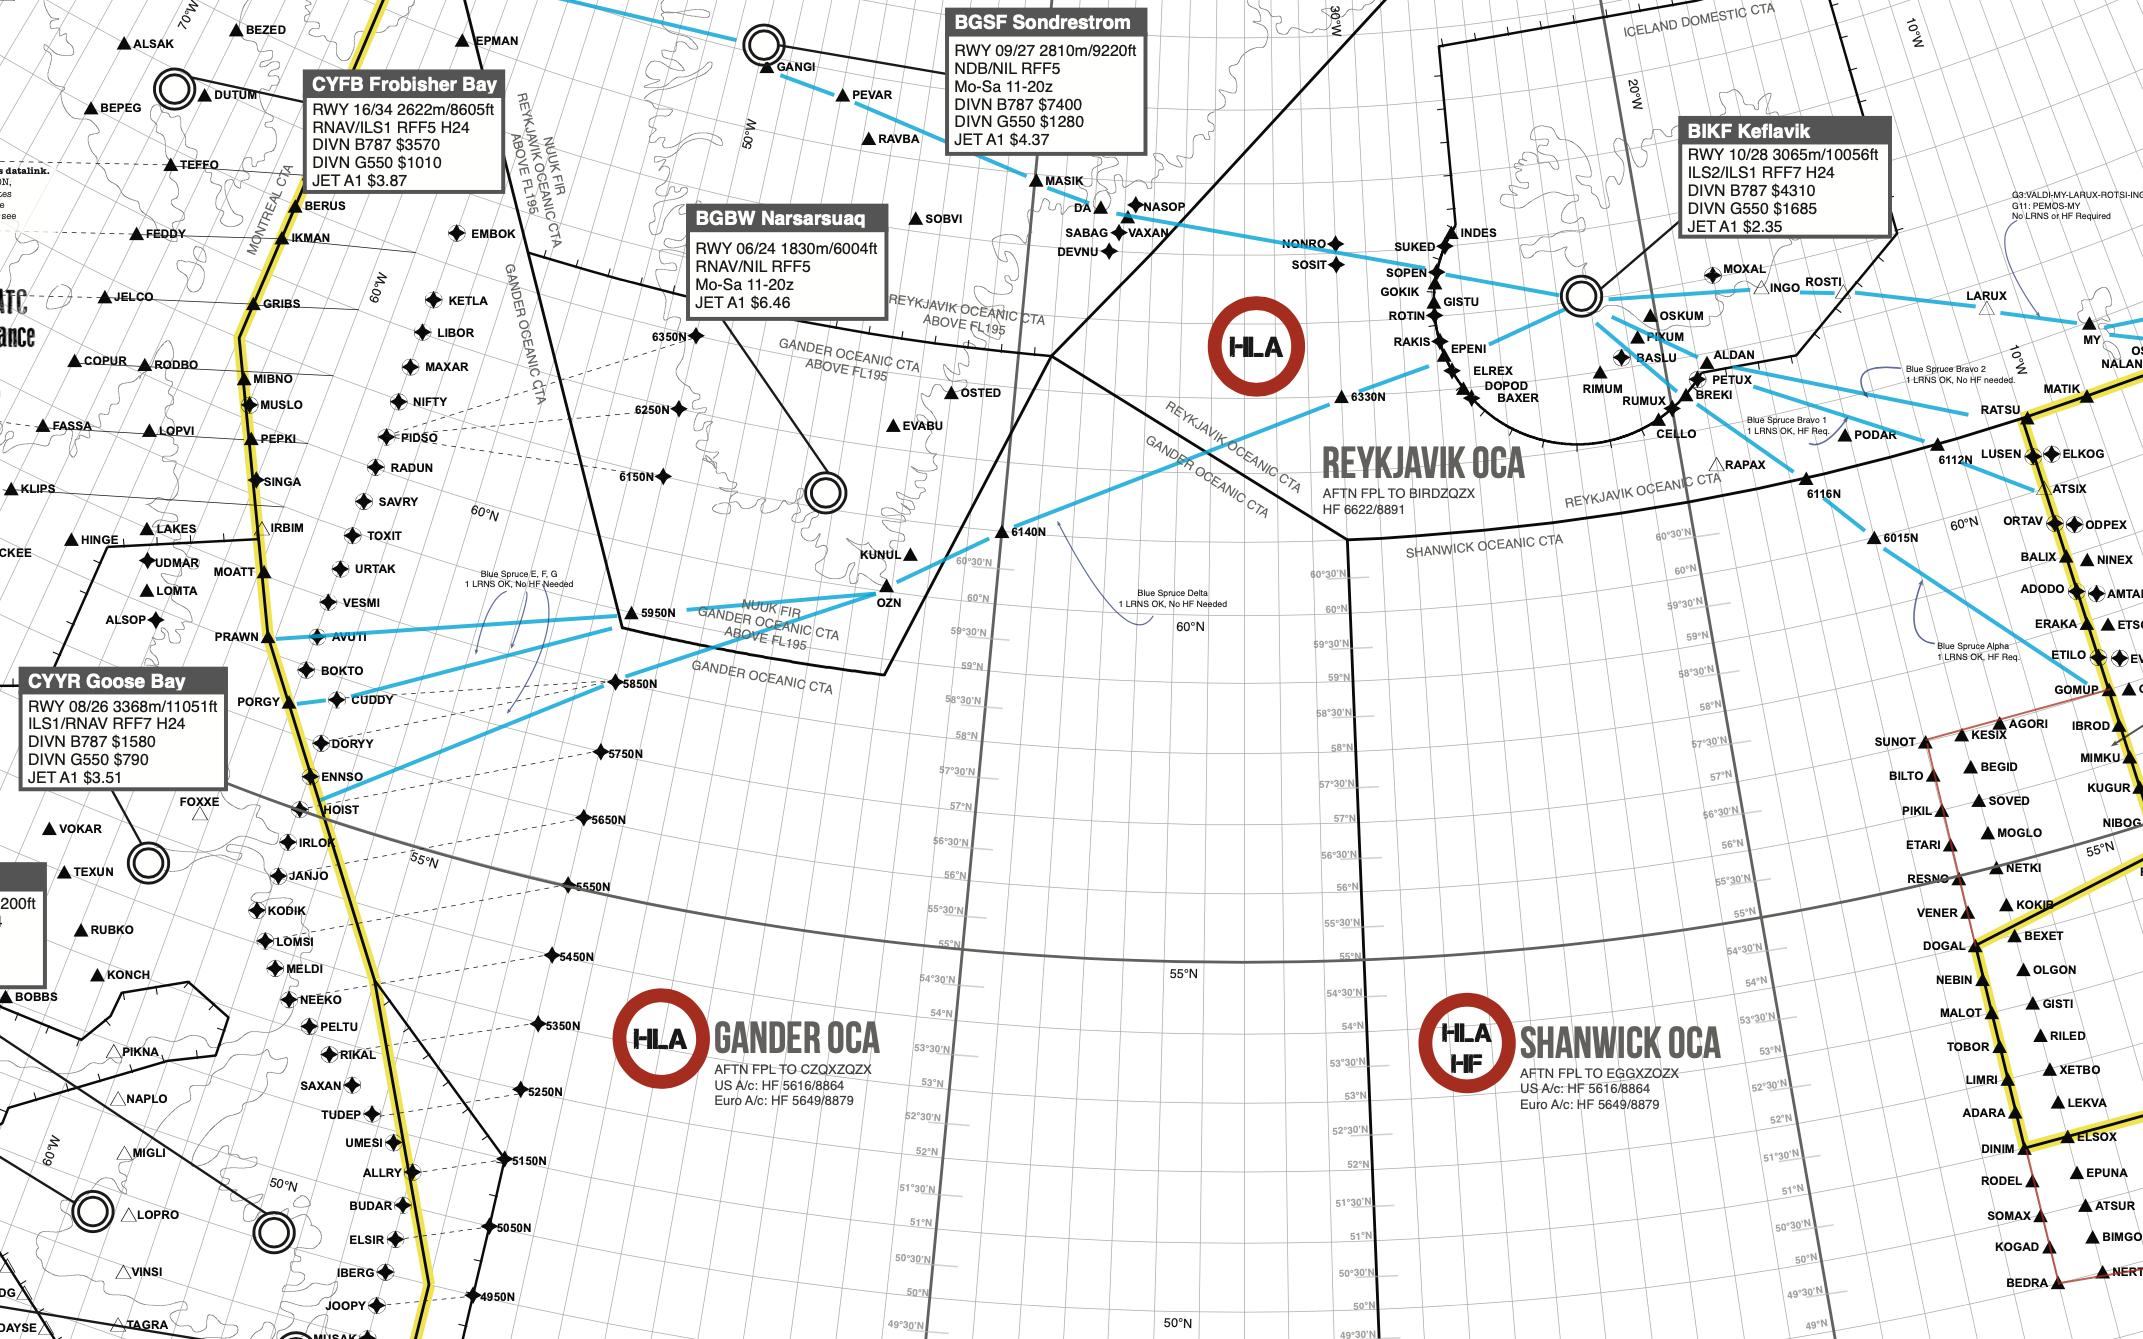 2019 Updated North Atlantic Plotting Chart